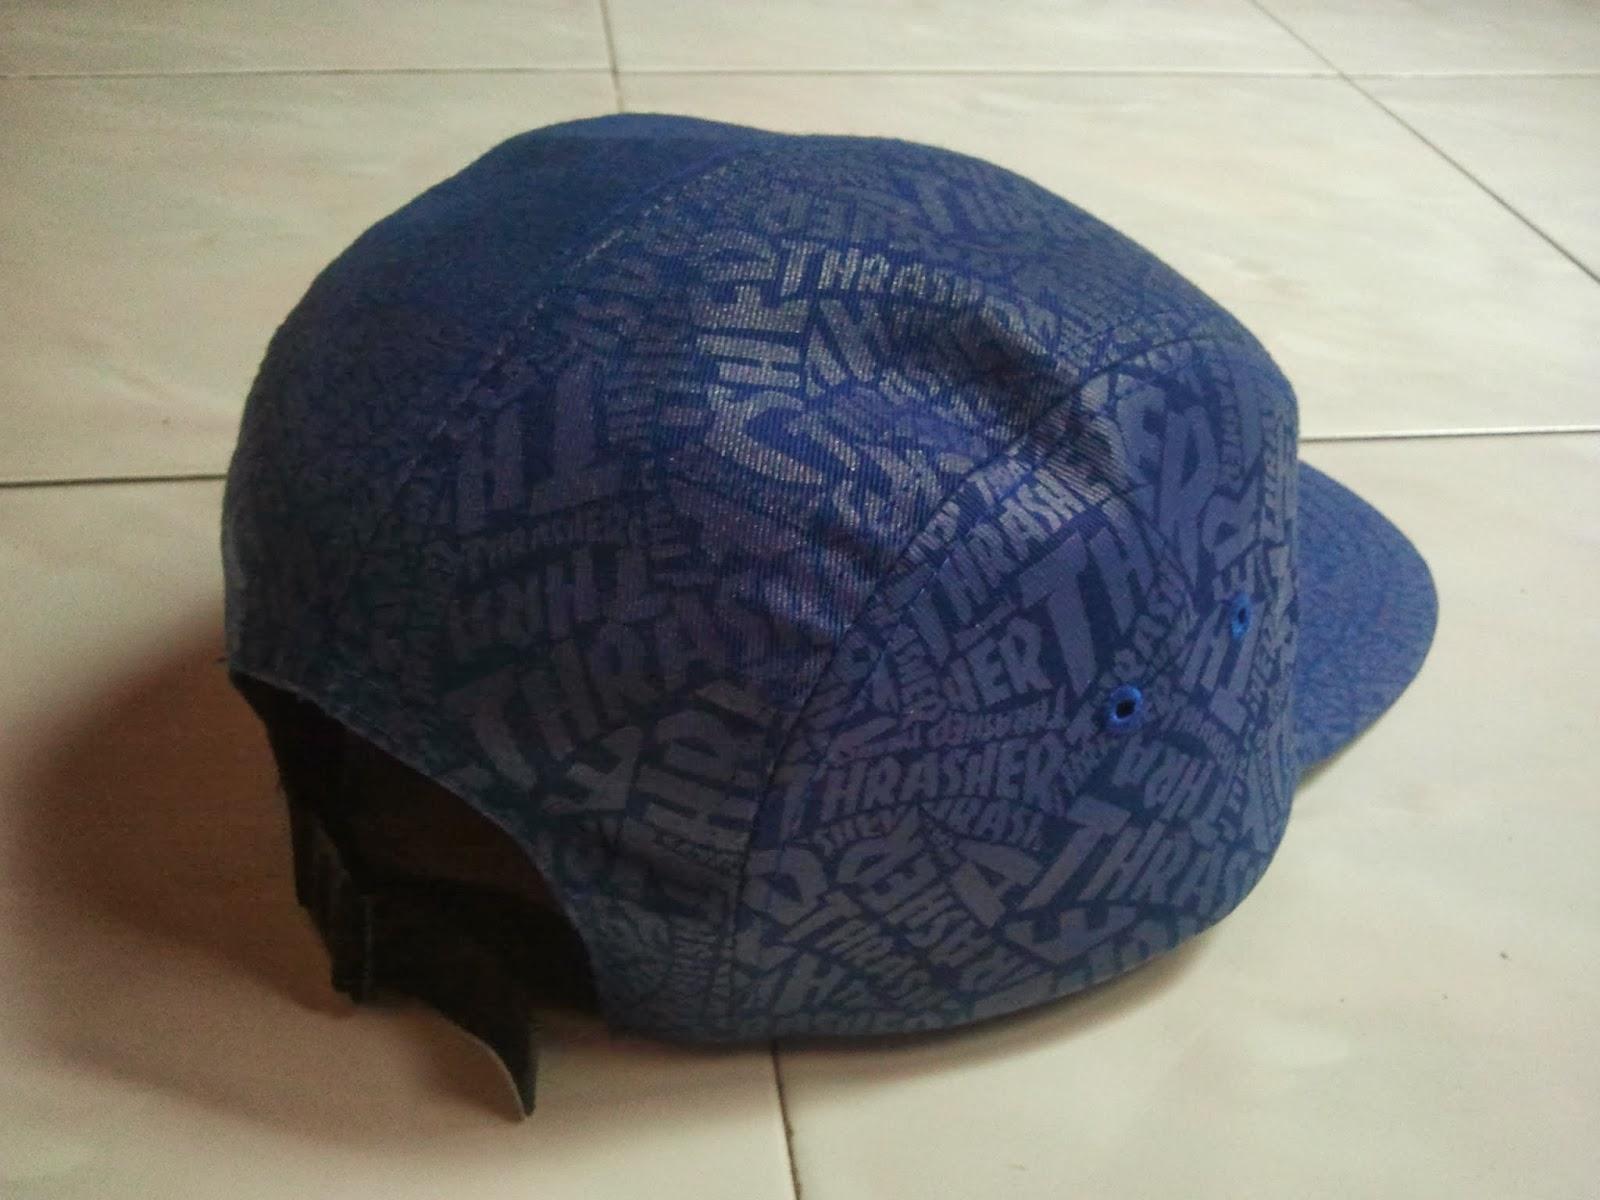 665401834e2 (WL-1905) All Over 5 Panel Cap By Thrasher Magazine Headwear